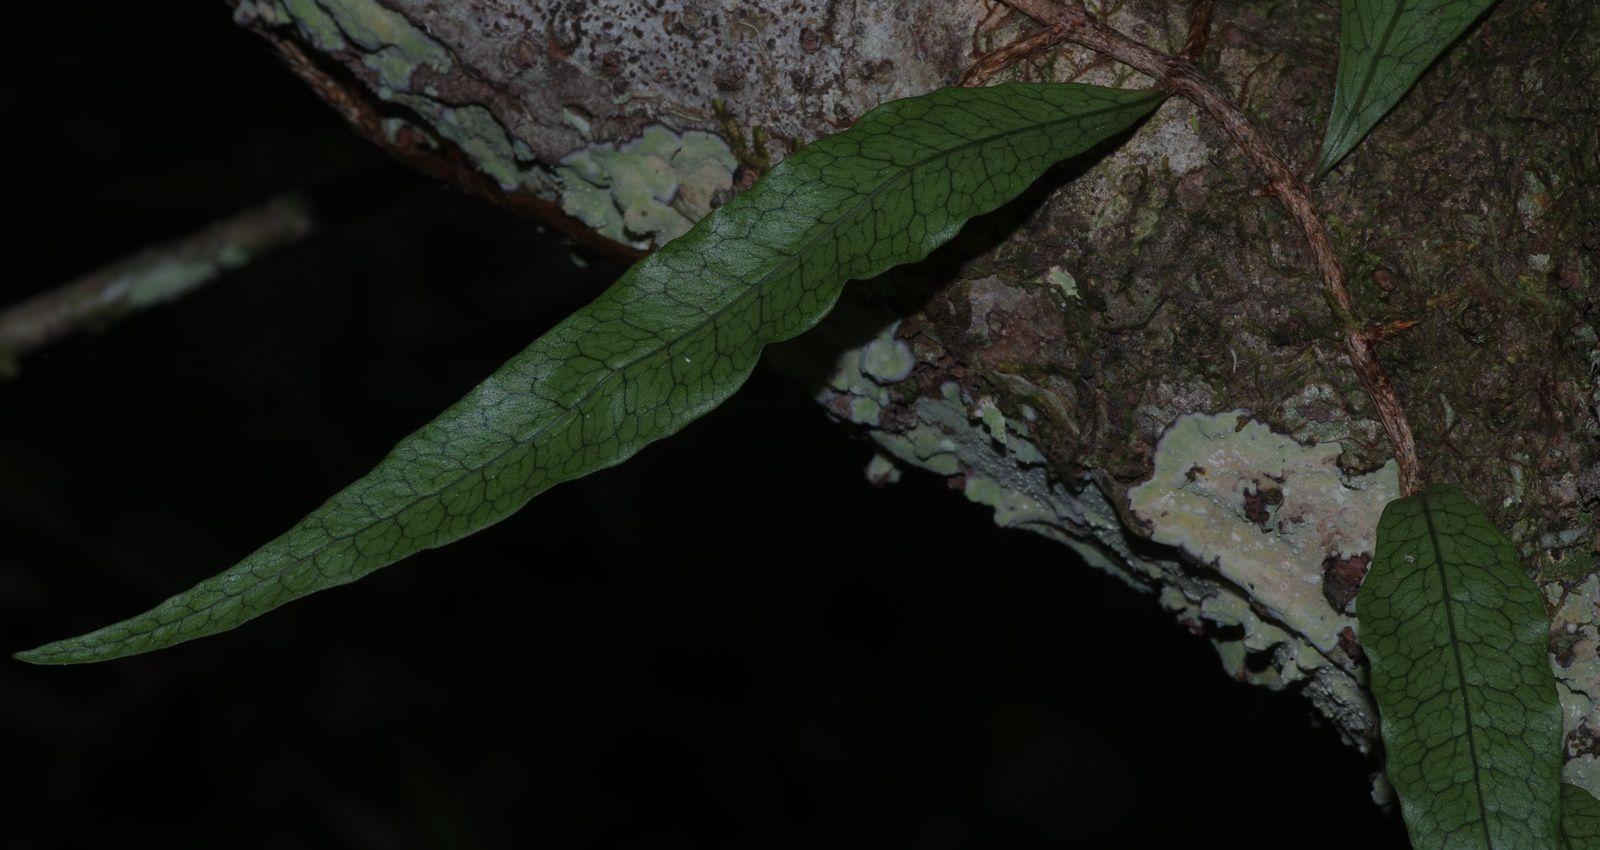 Microgramma lycopodioides